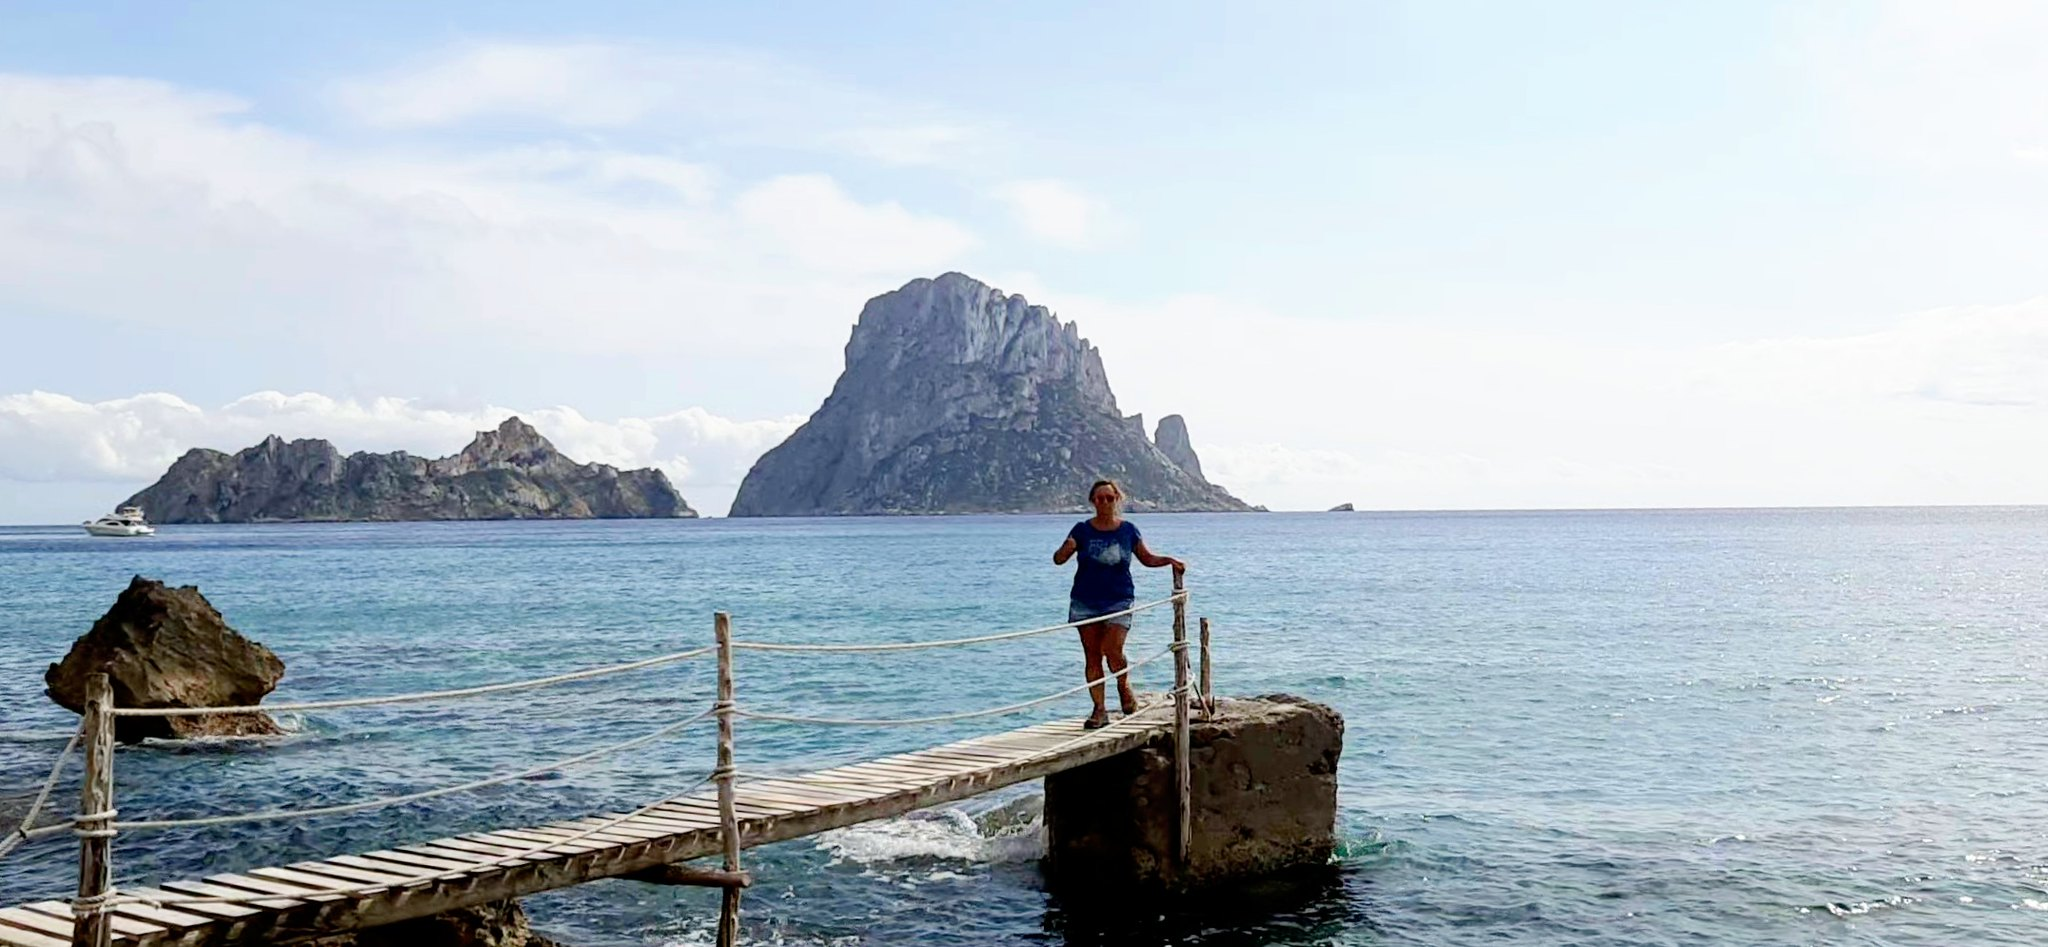 Cala D'Hort, Ibiza, 25 de mayo 2021